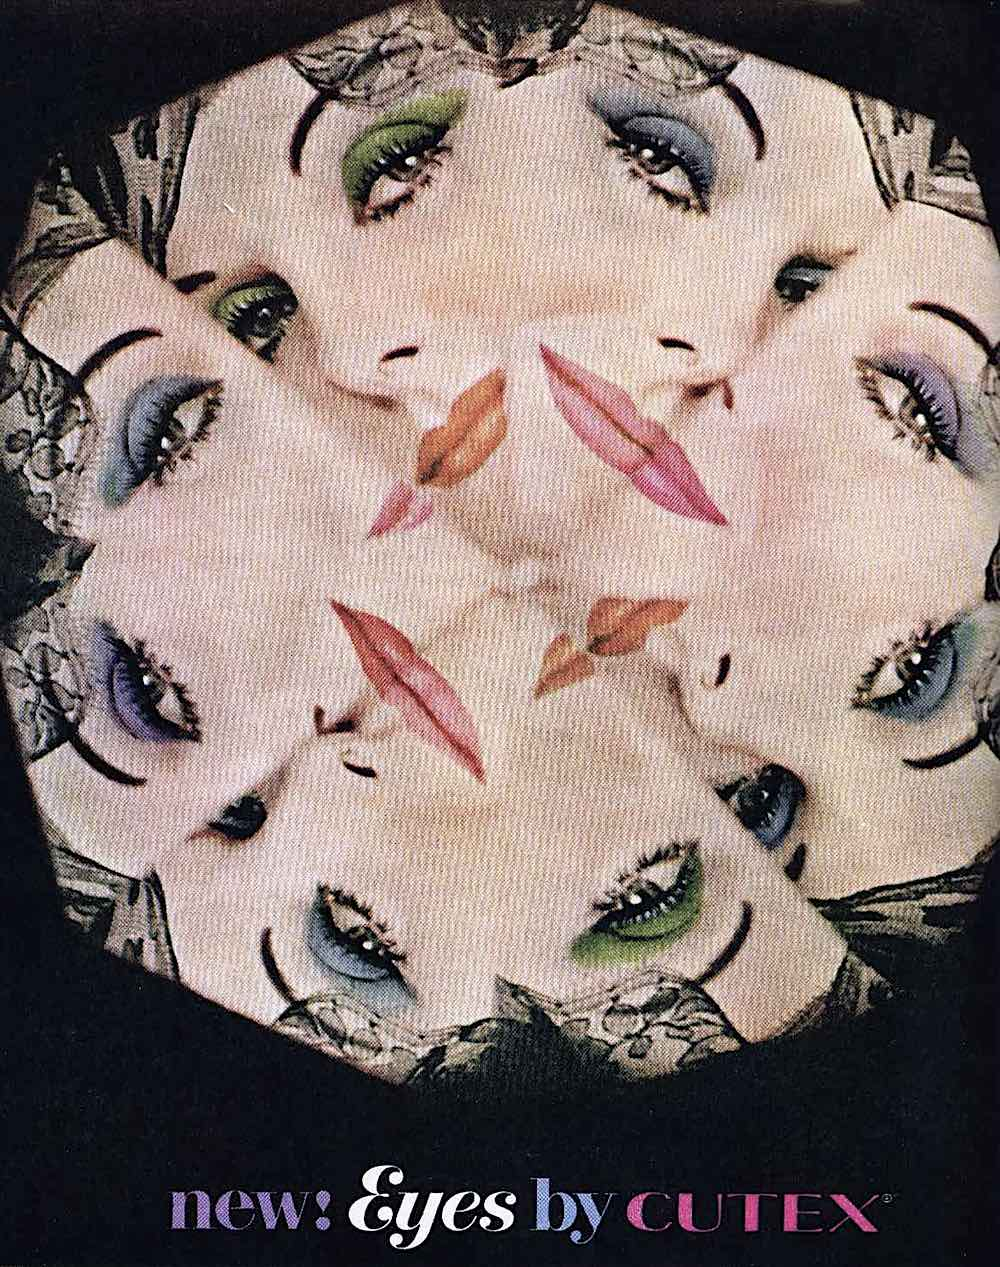 an Oleg Cassini 1962 ad design for Cutex, kaleidoscope